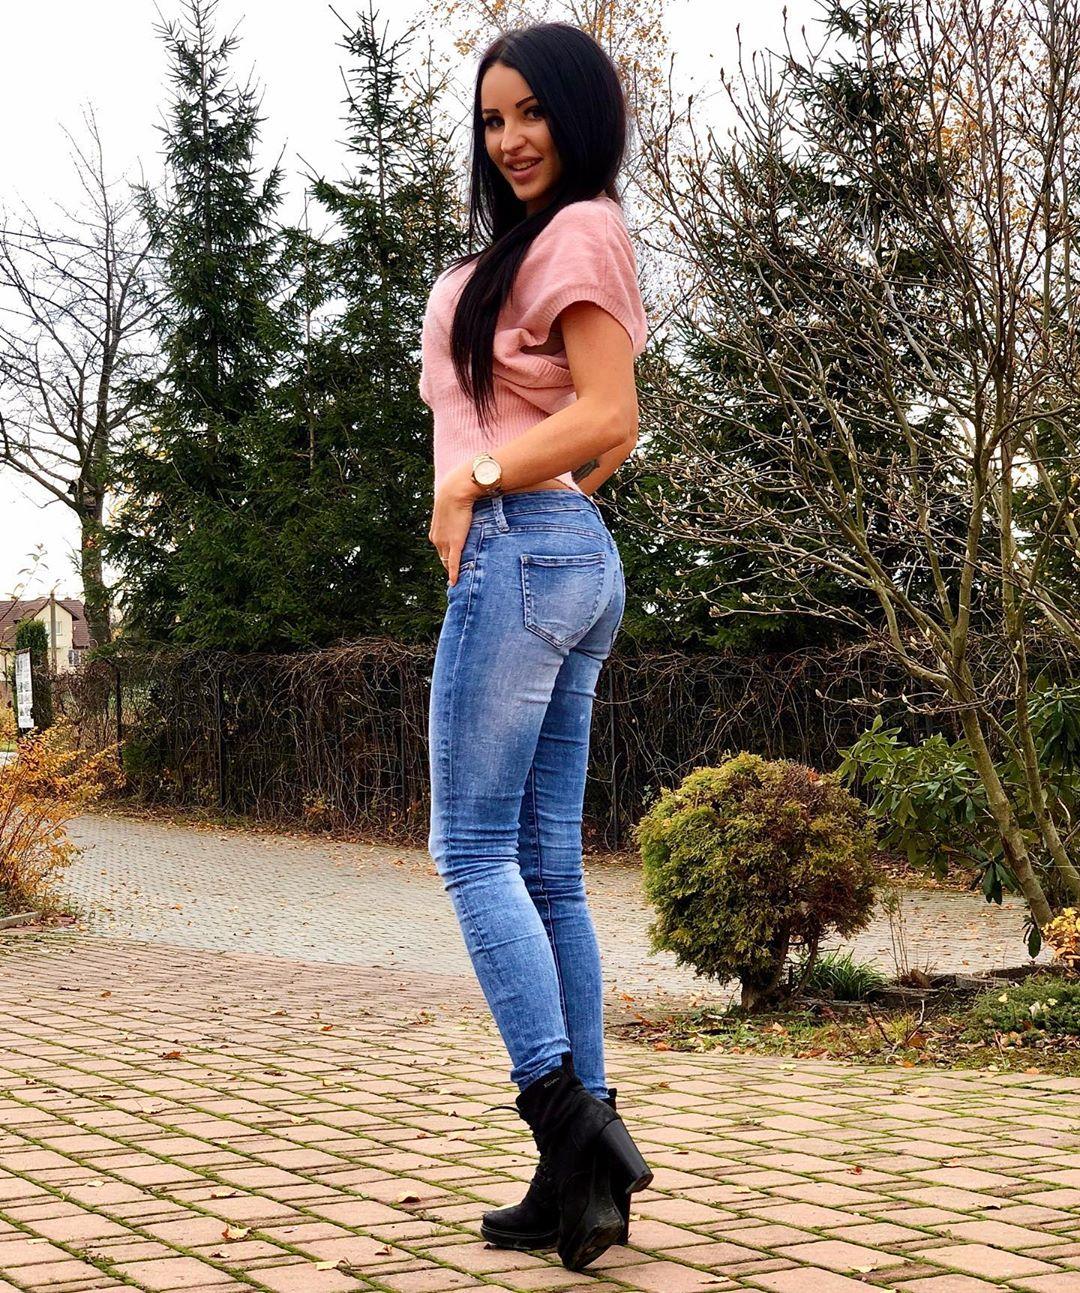 Natalia-Fitnesska-Wallpapers-Insta-Fit-Bio-9